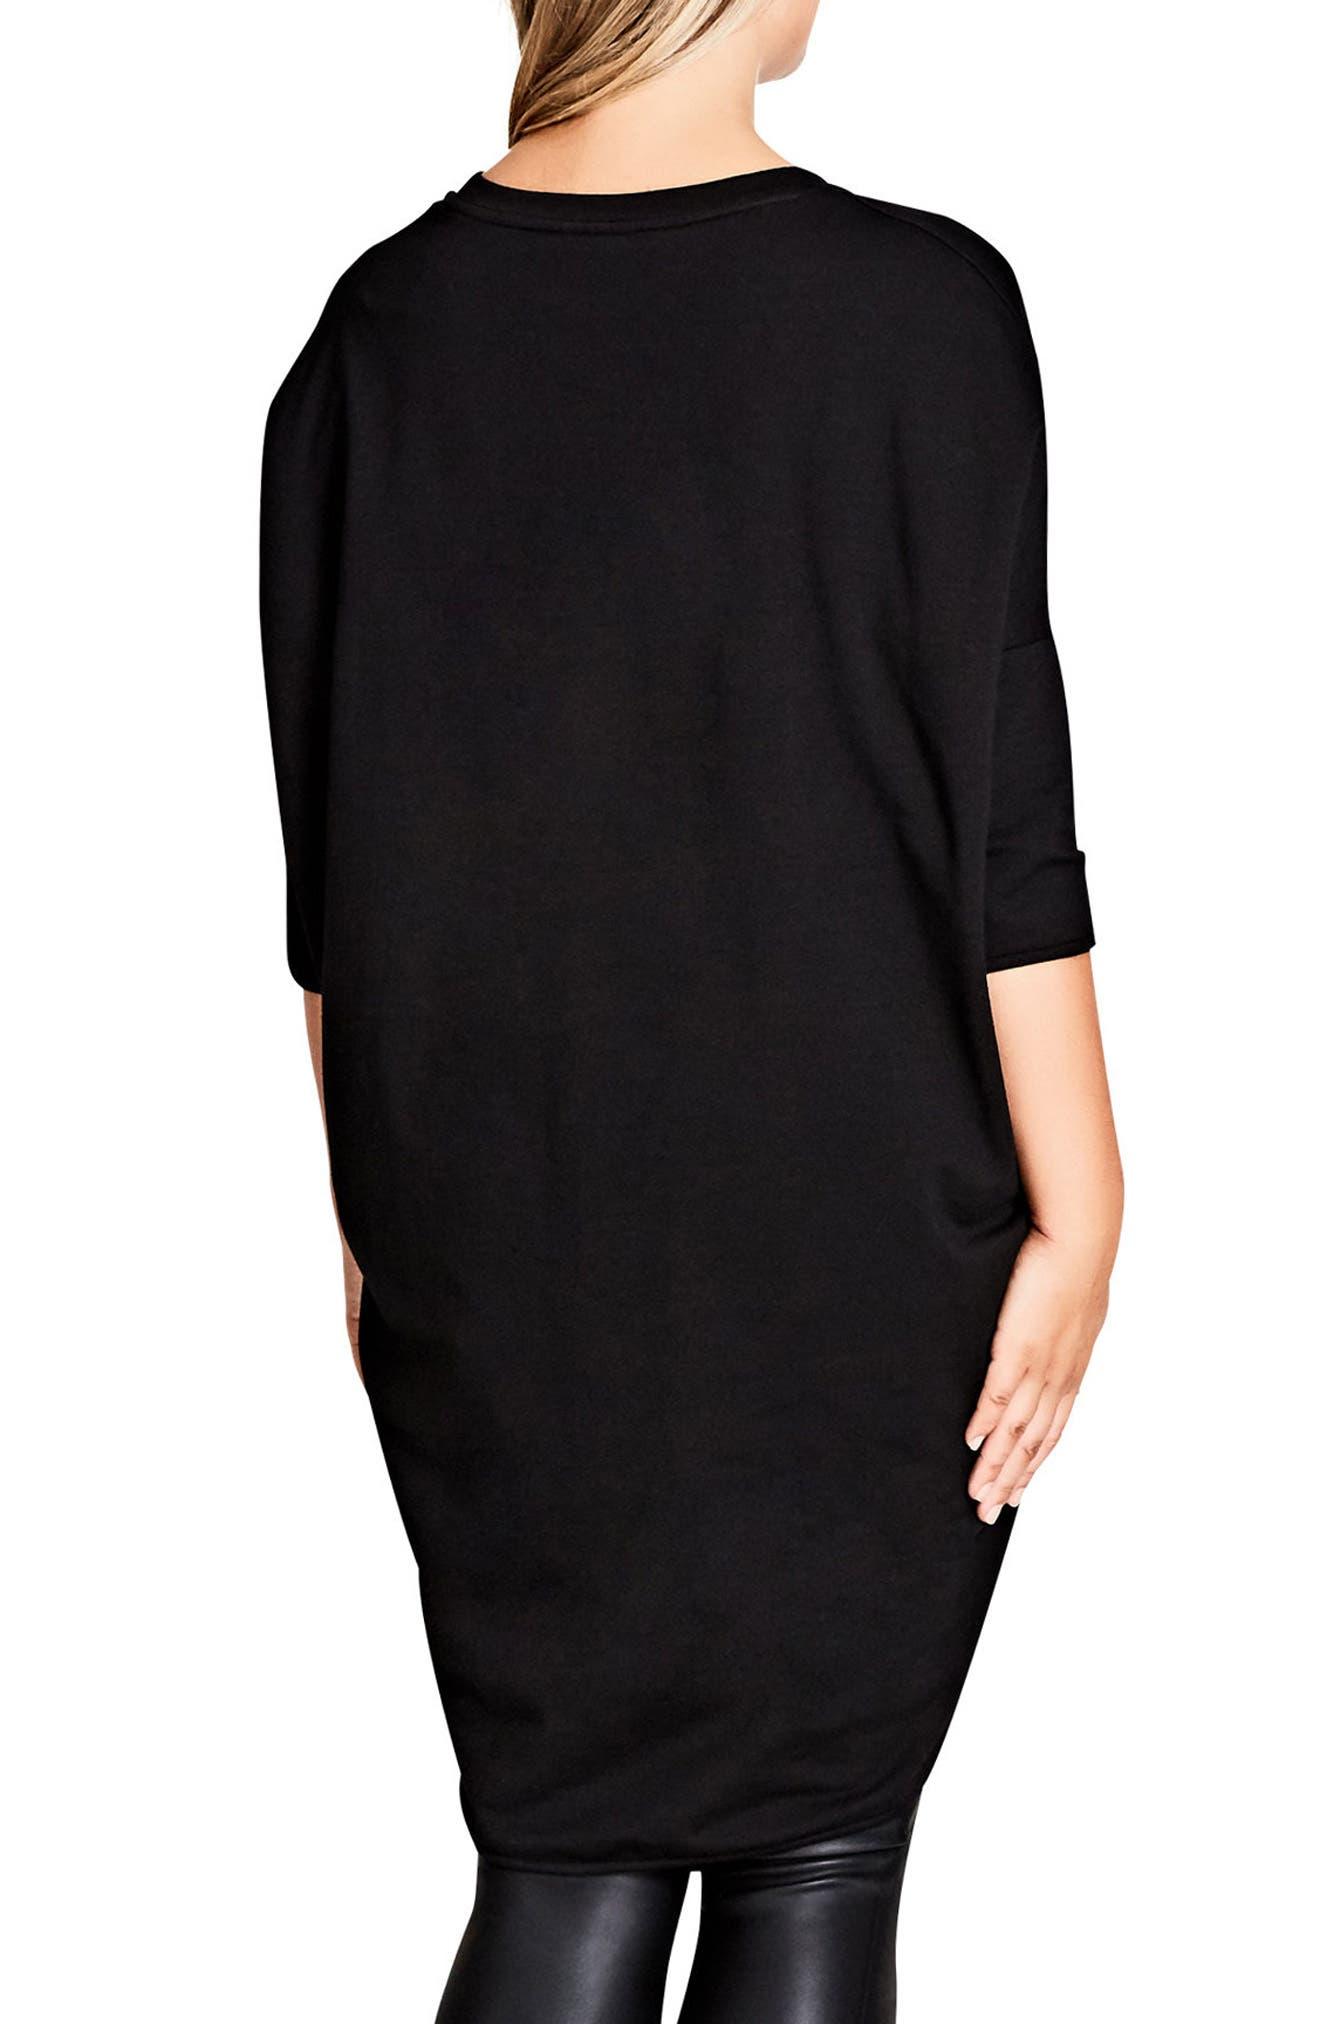 Alternate Image 2  - City Chic Oversize Knit Tee (Plus Size)